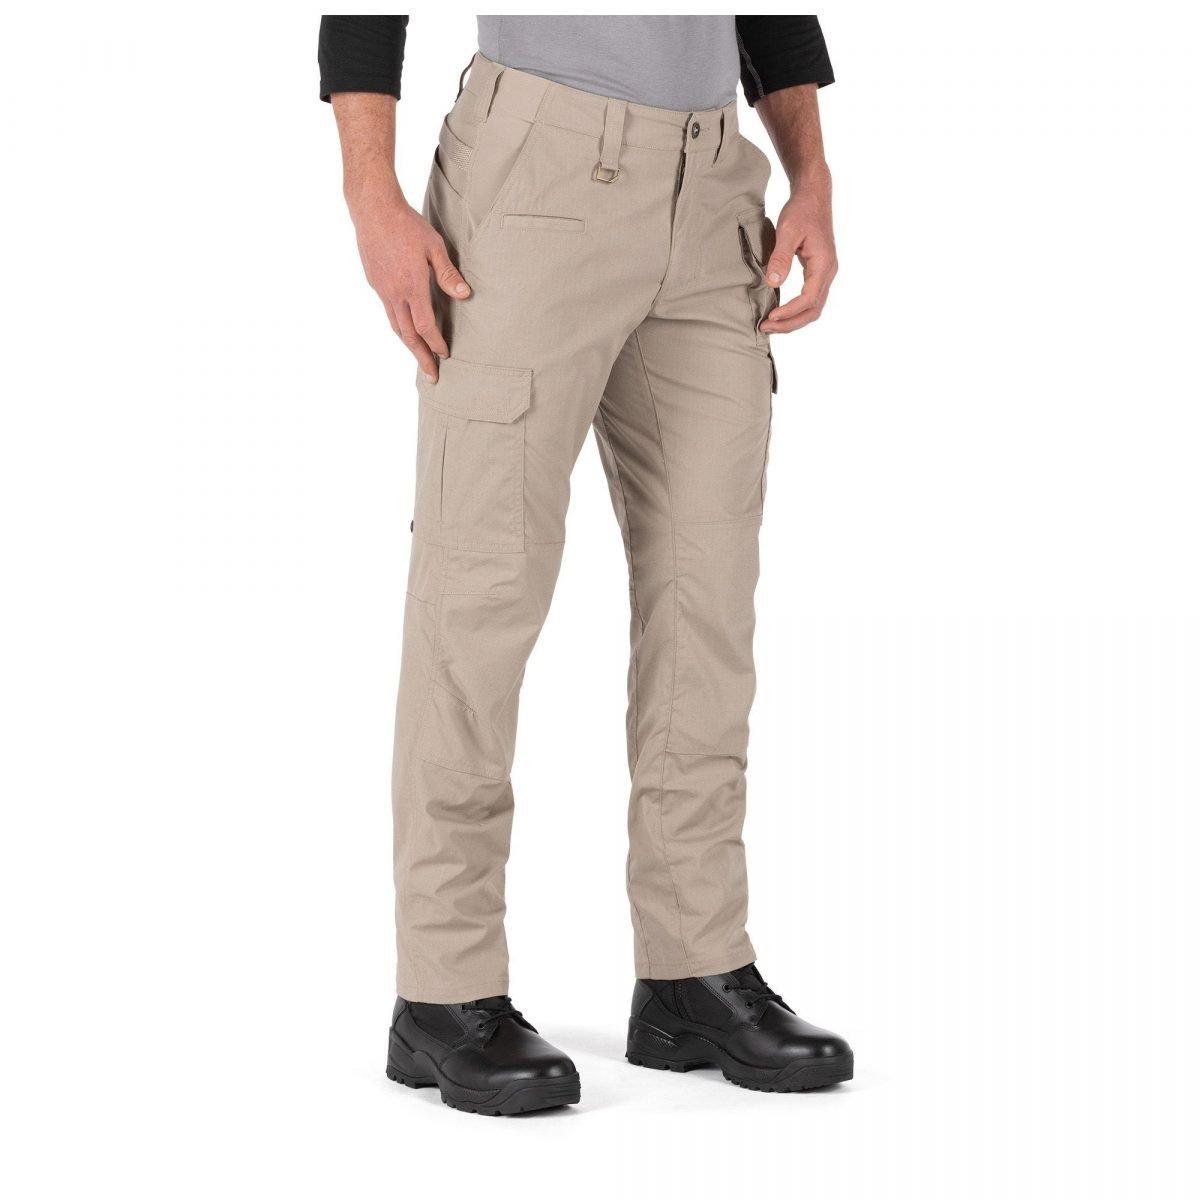 Pantalones 5.11 - ABR™ Pro